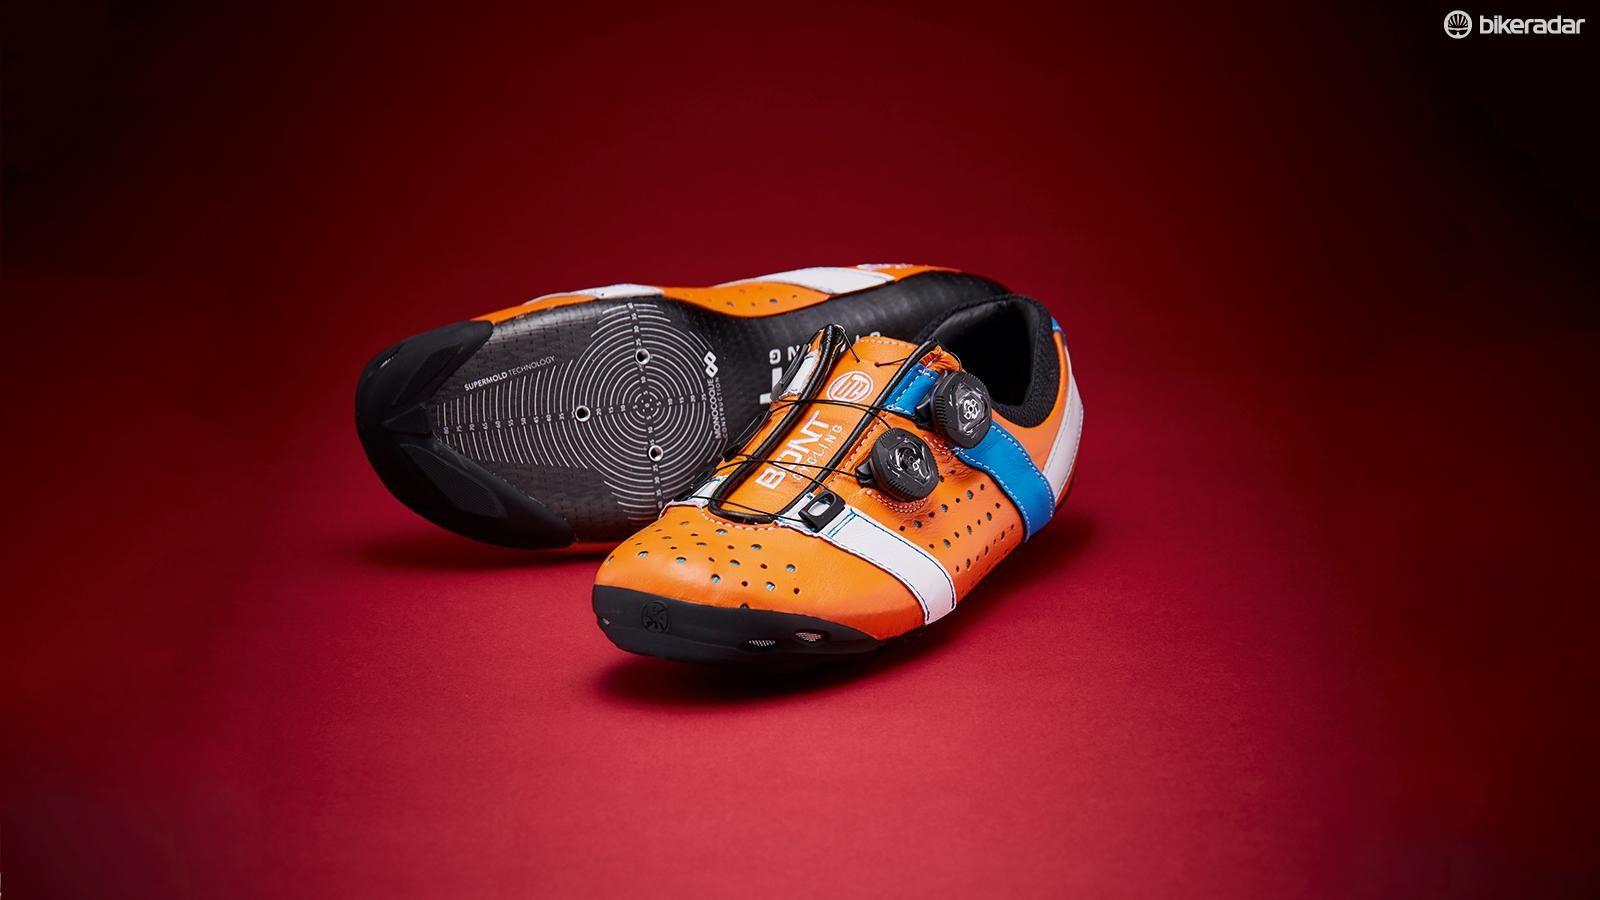 Bont's Vaypor+ cycling shoe